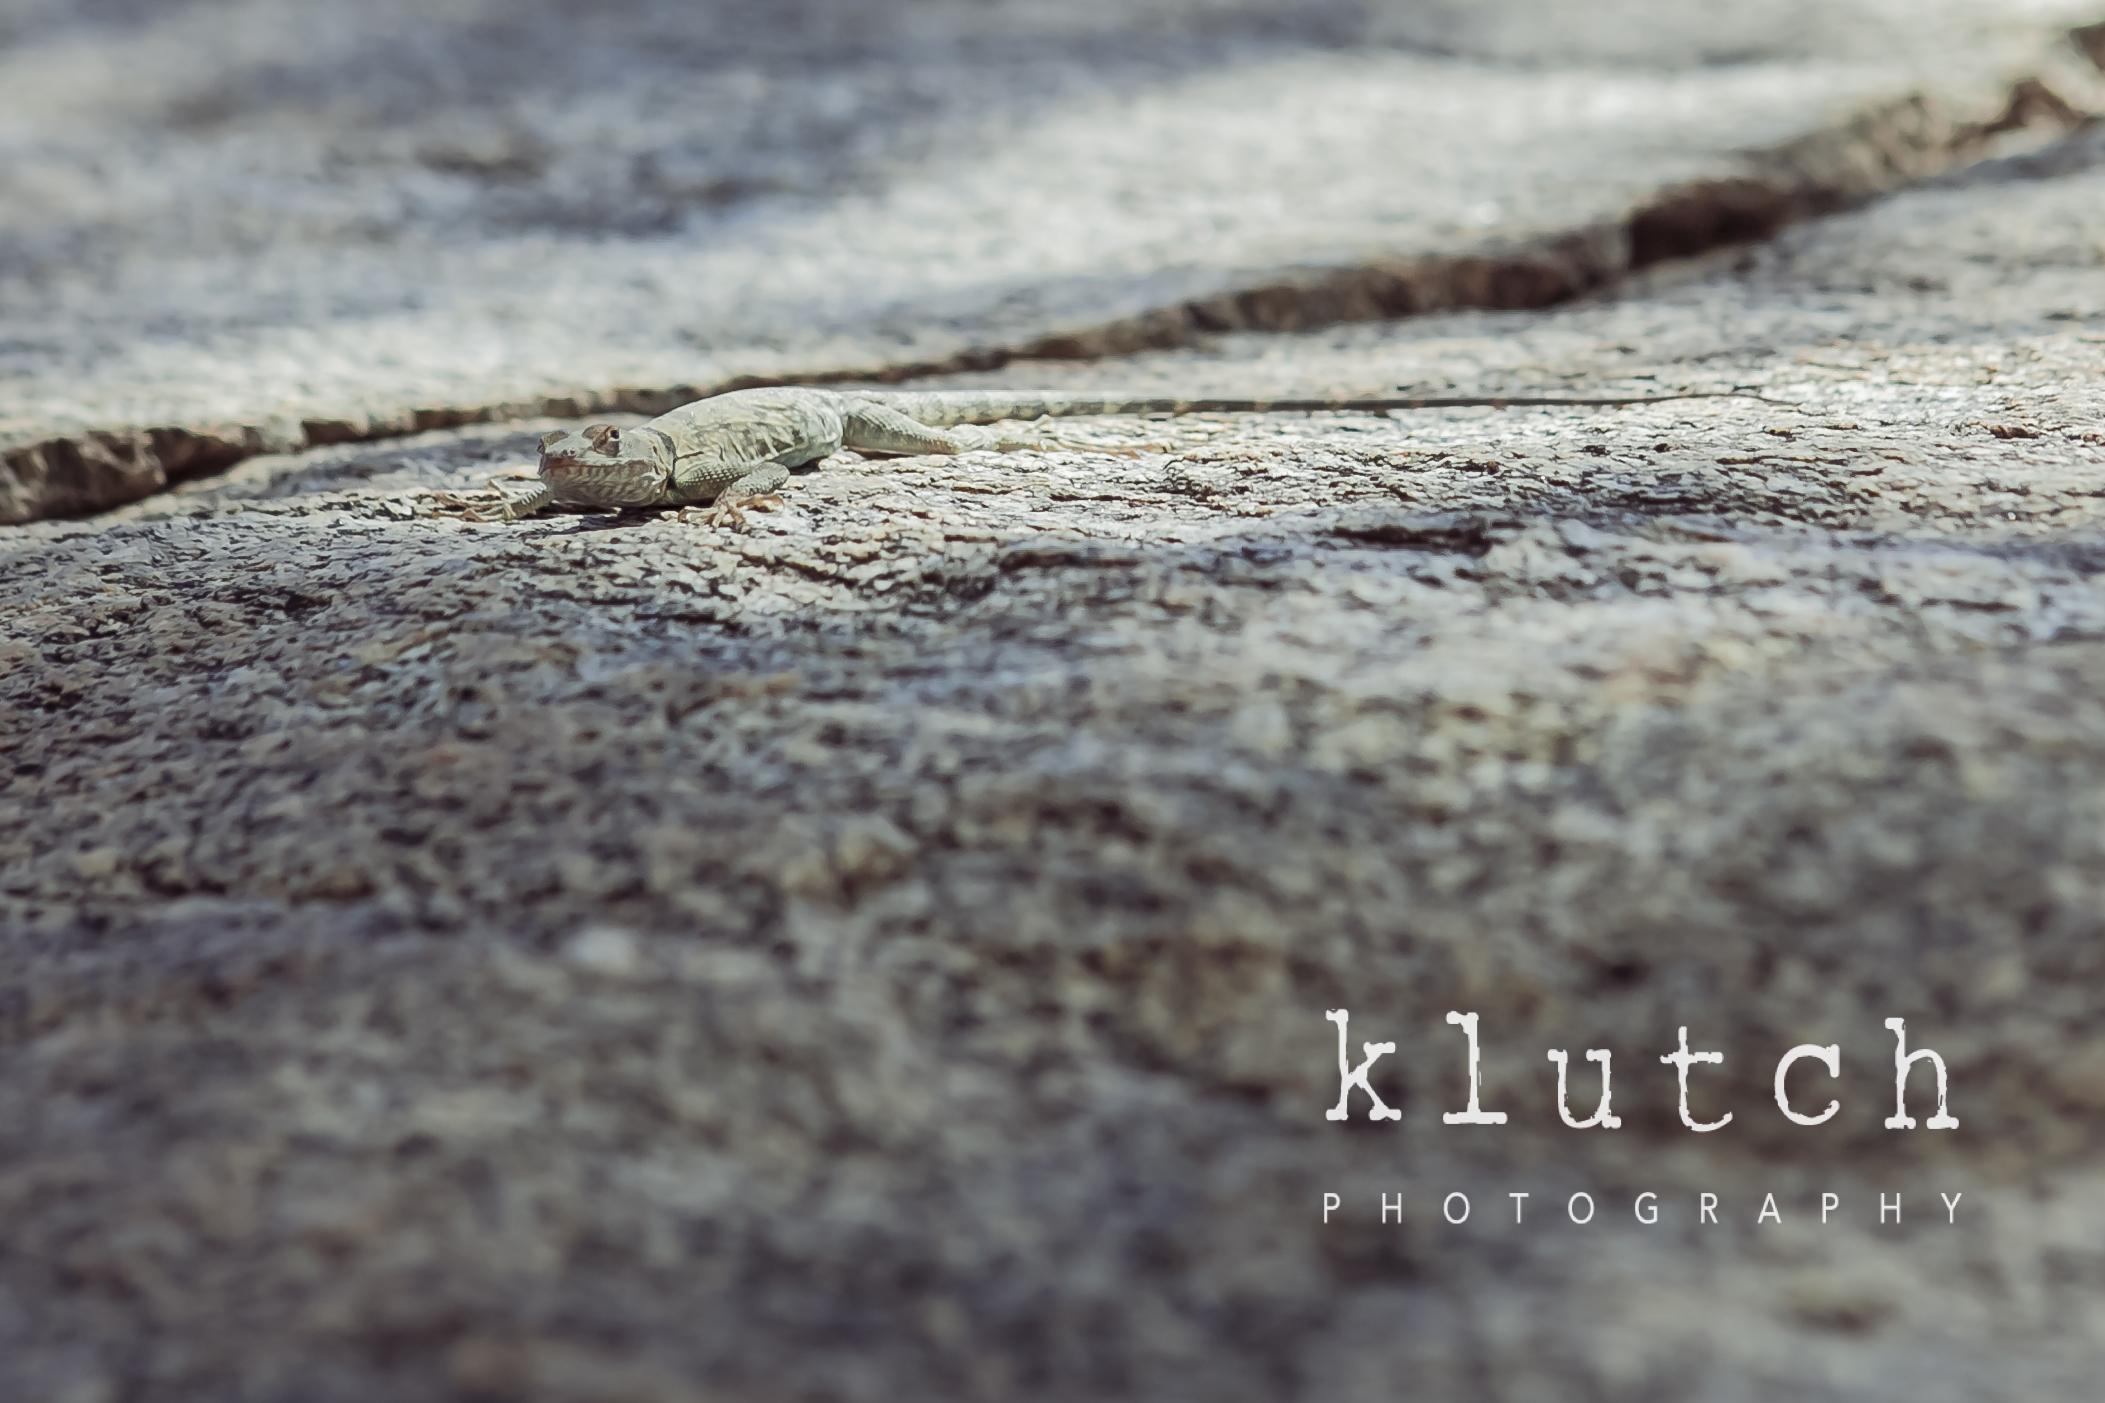 Klutch Photography,white rock family photographer, vancouver family photographer, whiterock lifestyle photographer, life unscripted photographer, life unscripted session, photography,Dina Ferreira Stoddard-1-4.jpg